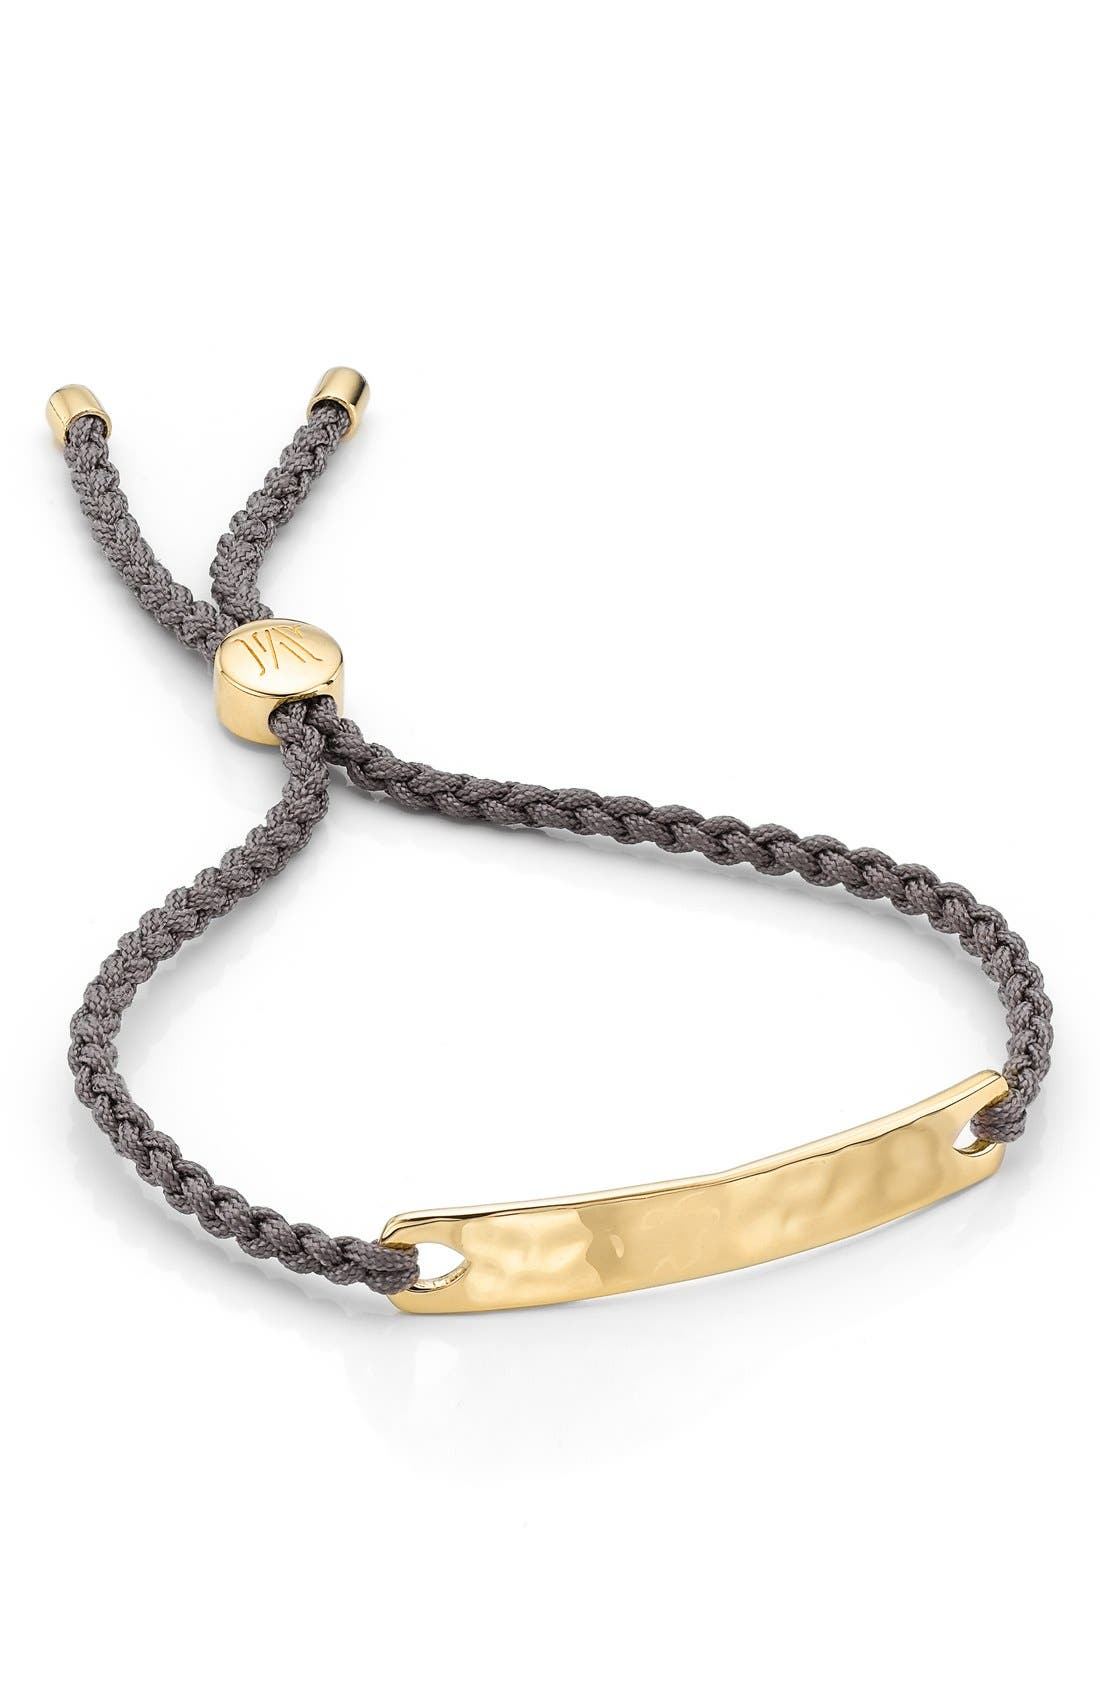 Alternate Image 1 Selected - Monica Vinader'Havana'Friendship Bracelet